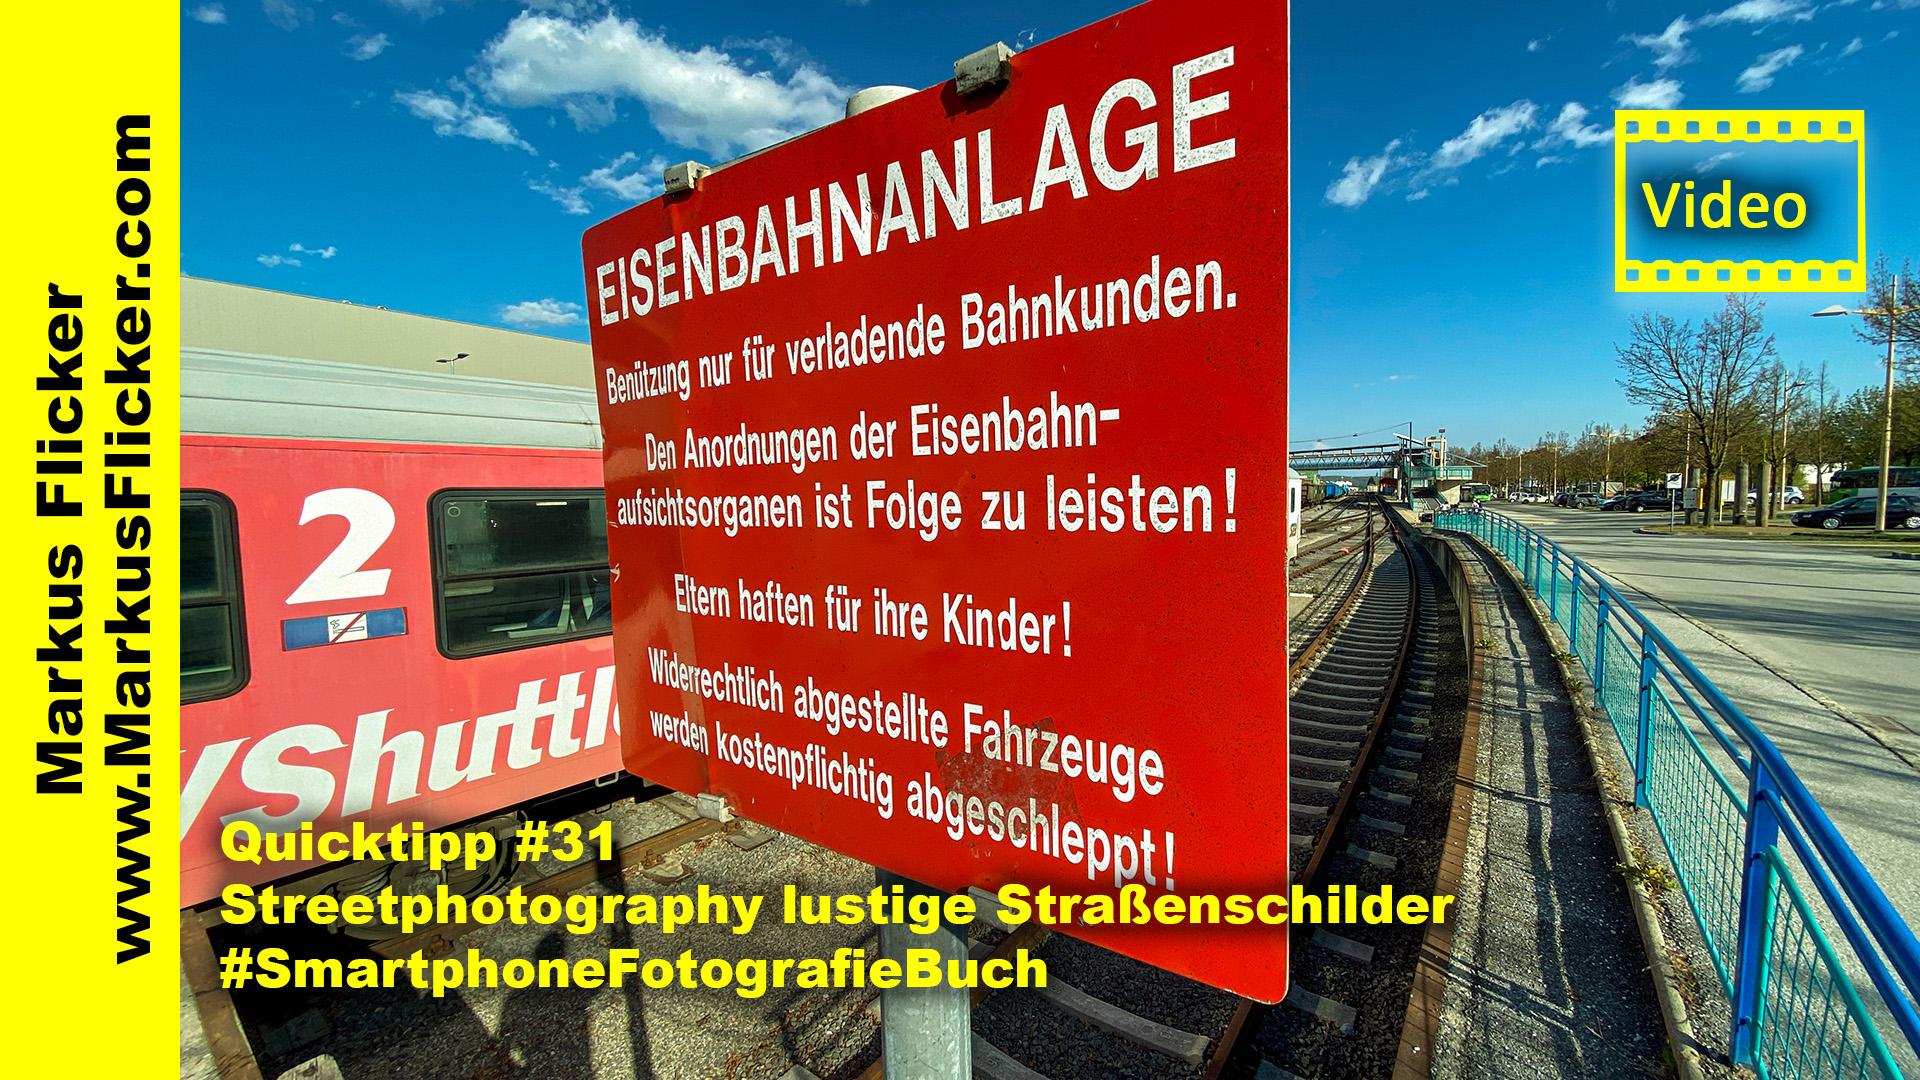 Quicktipp #31 Streetphotography lustige Straßenschilder #SmartphoneFotografieBuch #markusflicker